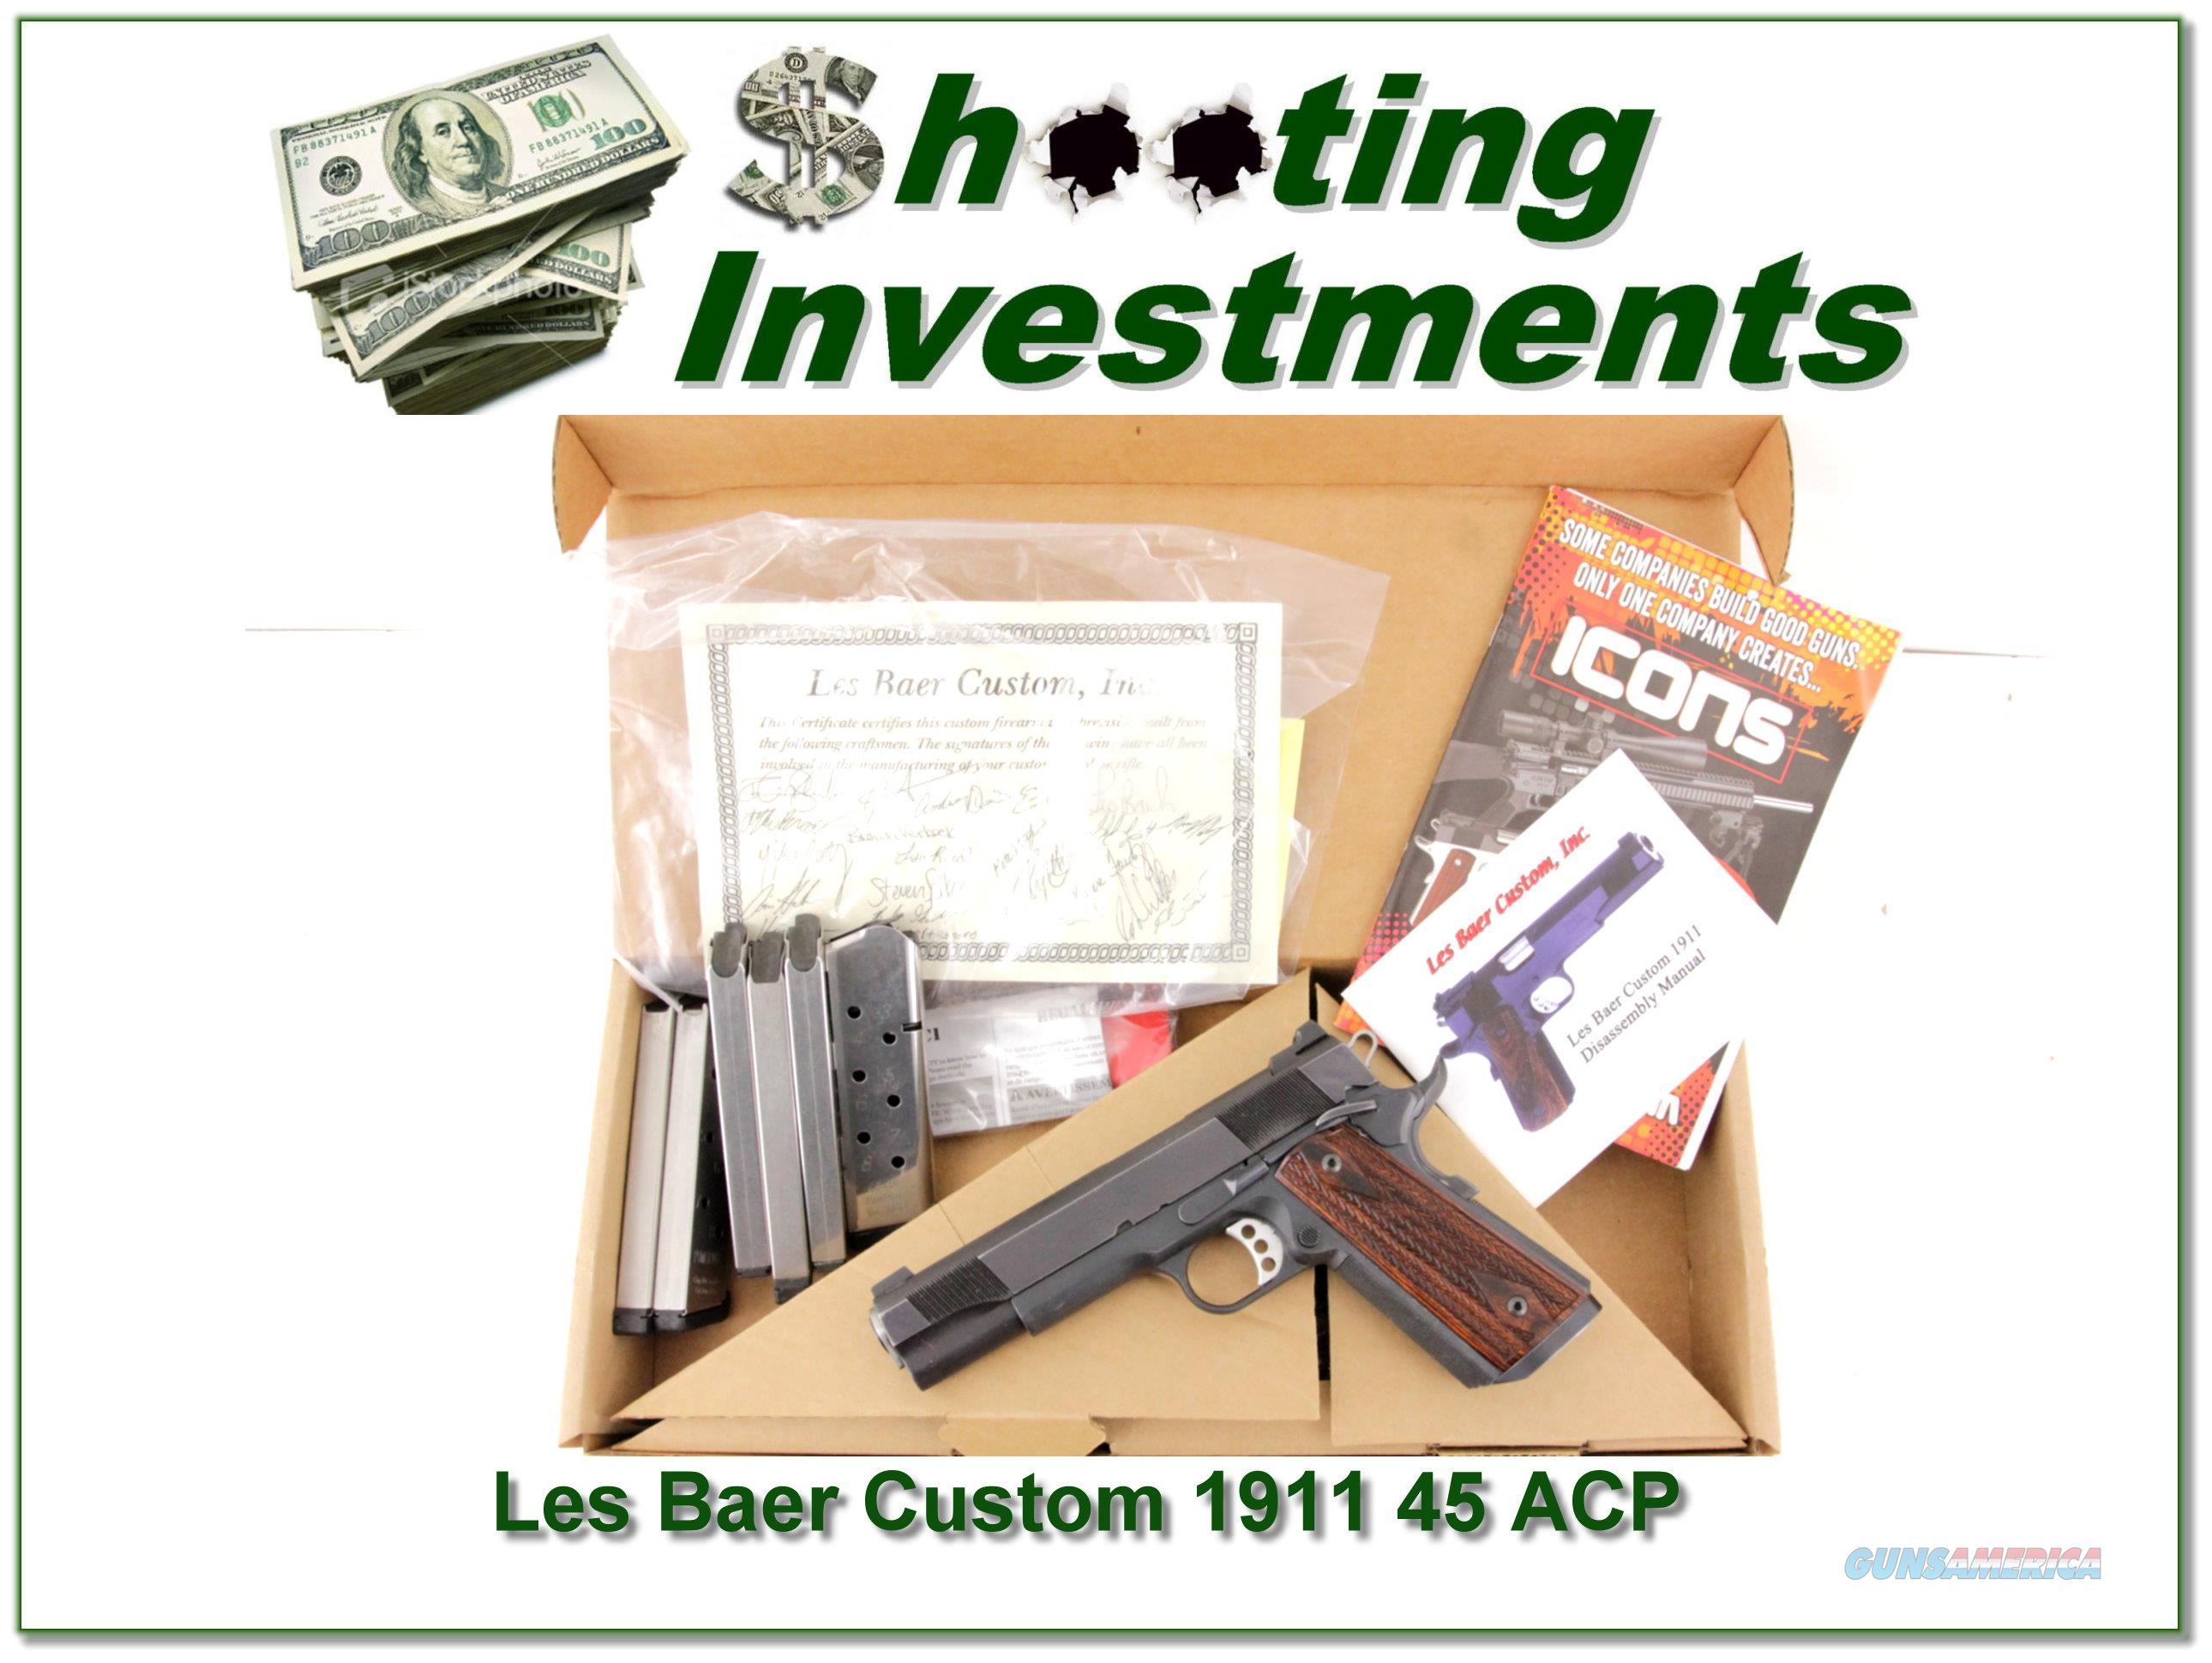 Les Baer Custom 45 ACP in box 6 Magazines  Guns > Pistols > Les Baer Pistols